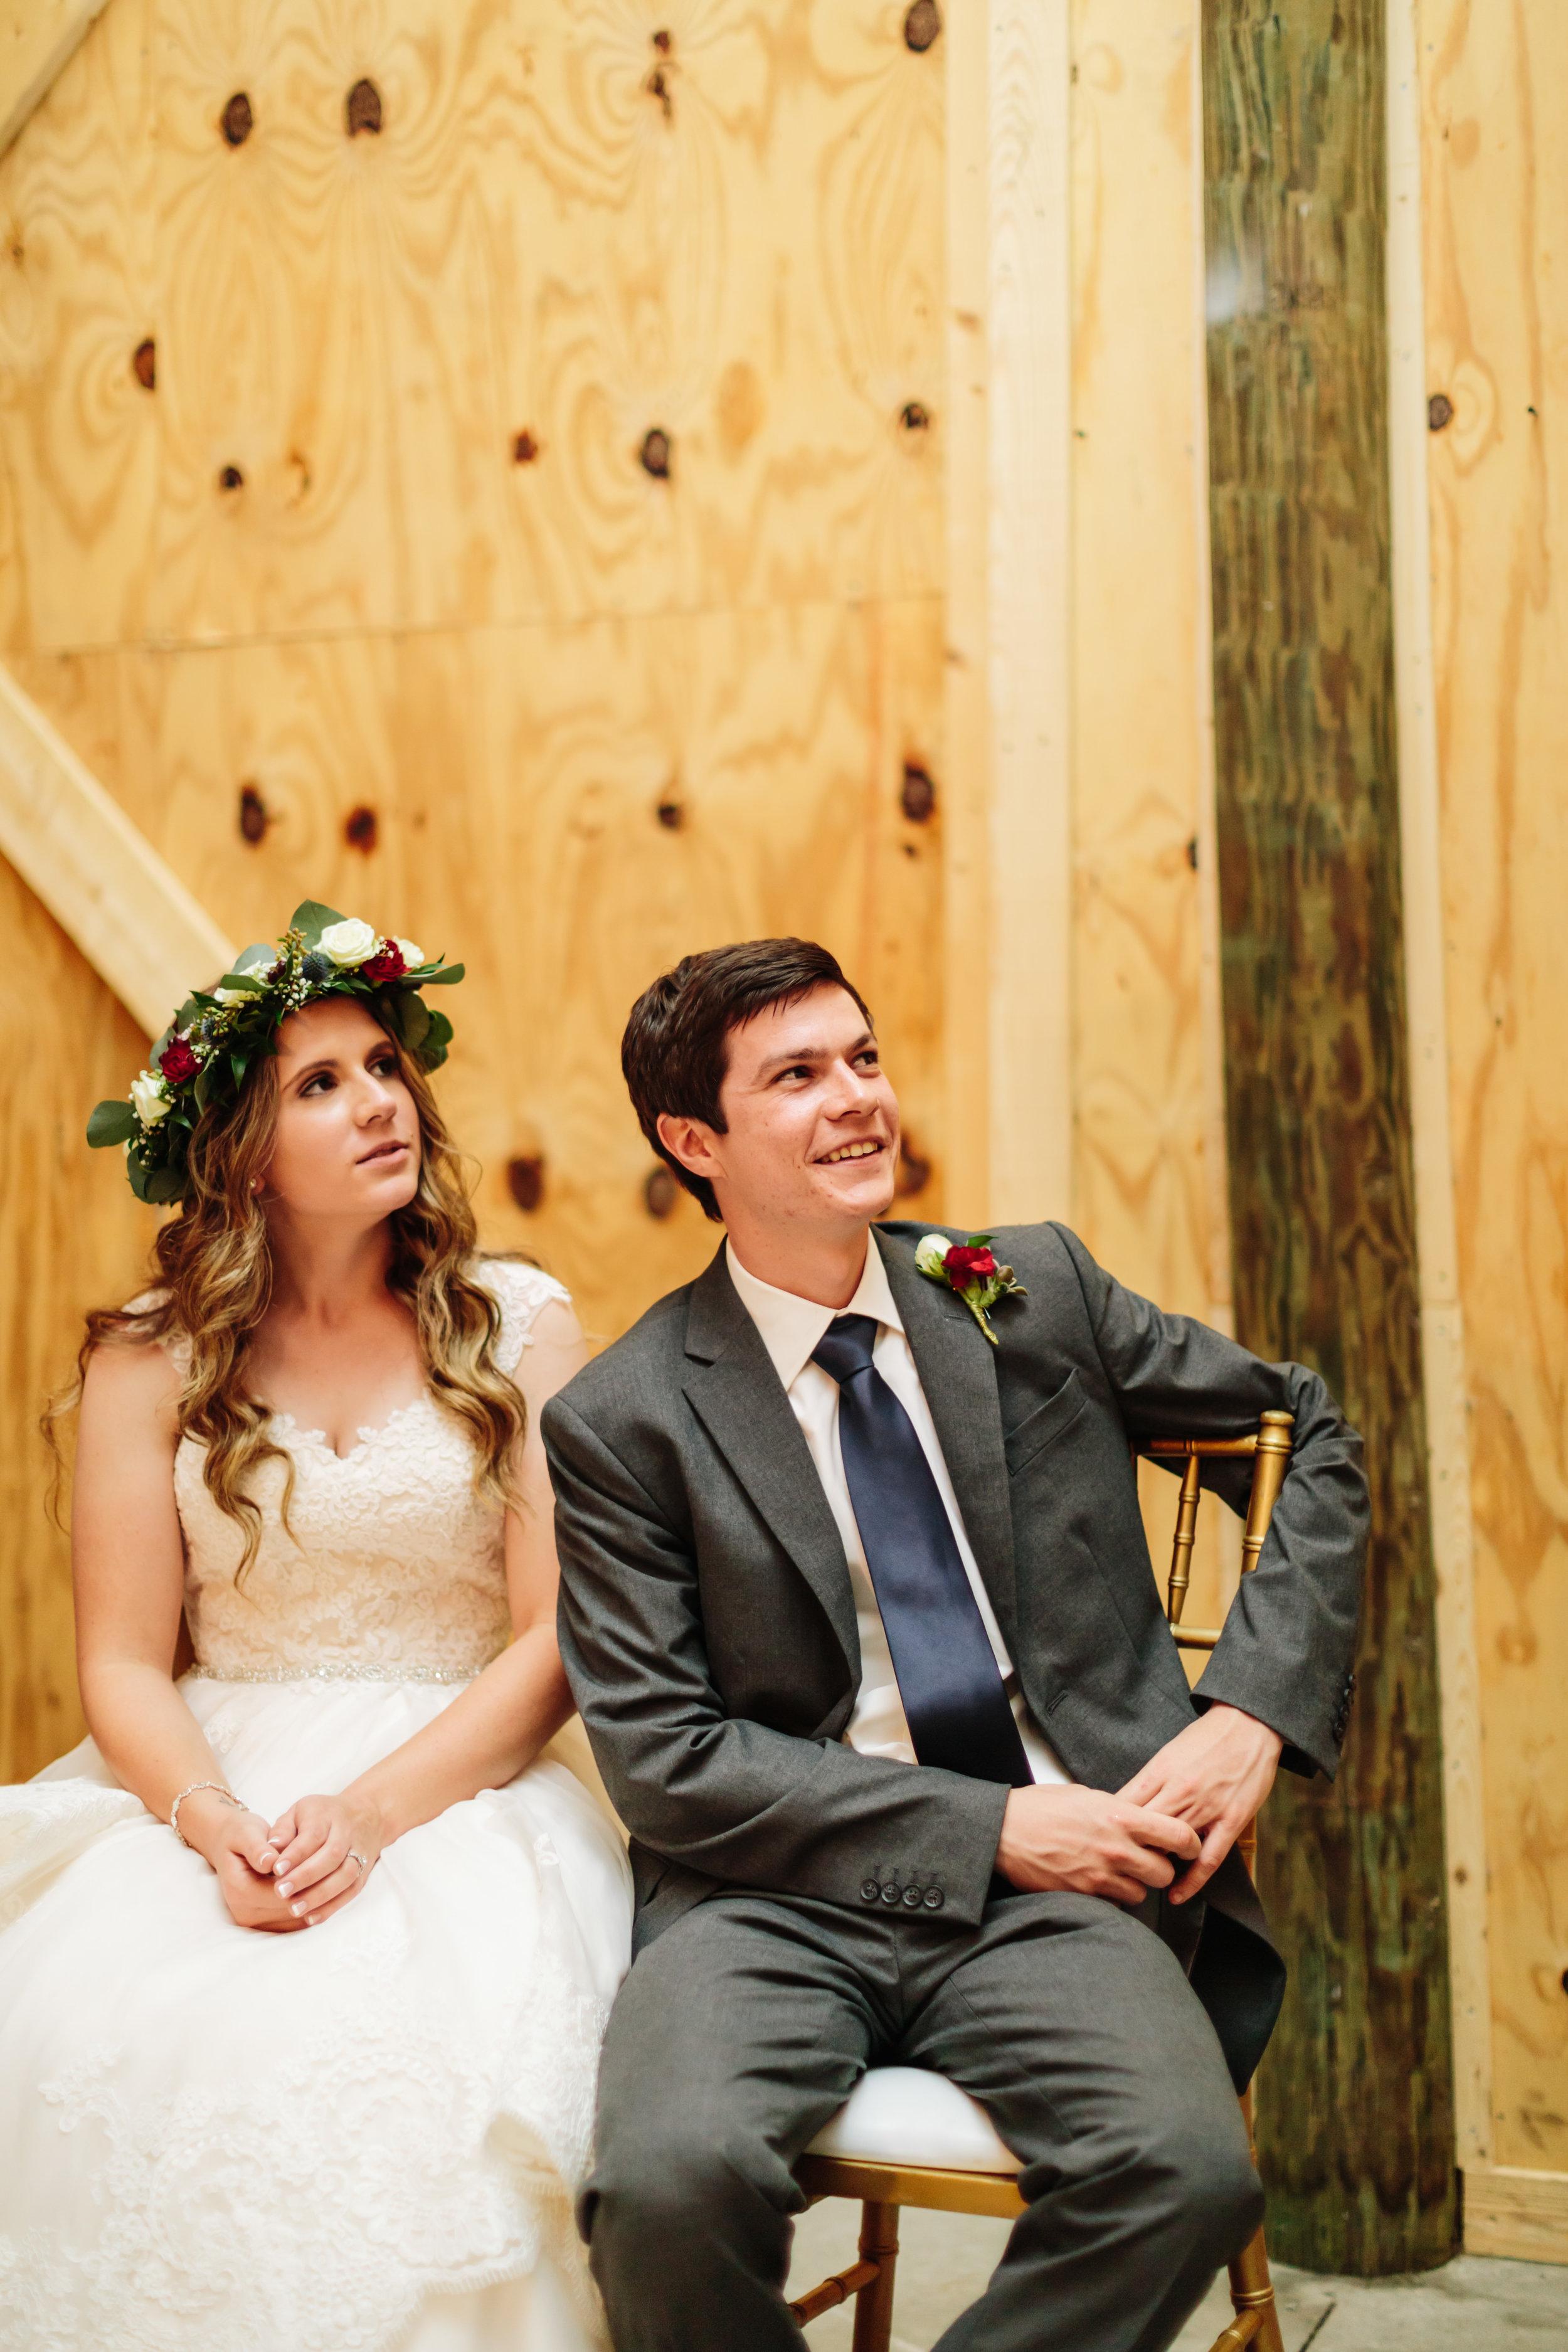 2018.04.14 Zak and Jamisyn Unrue Black Willow Barn Wedding Finals-719.jpg